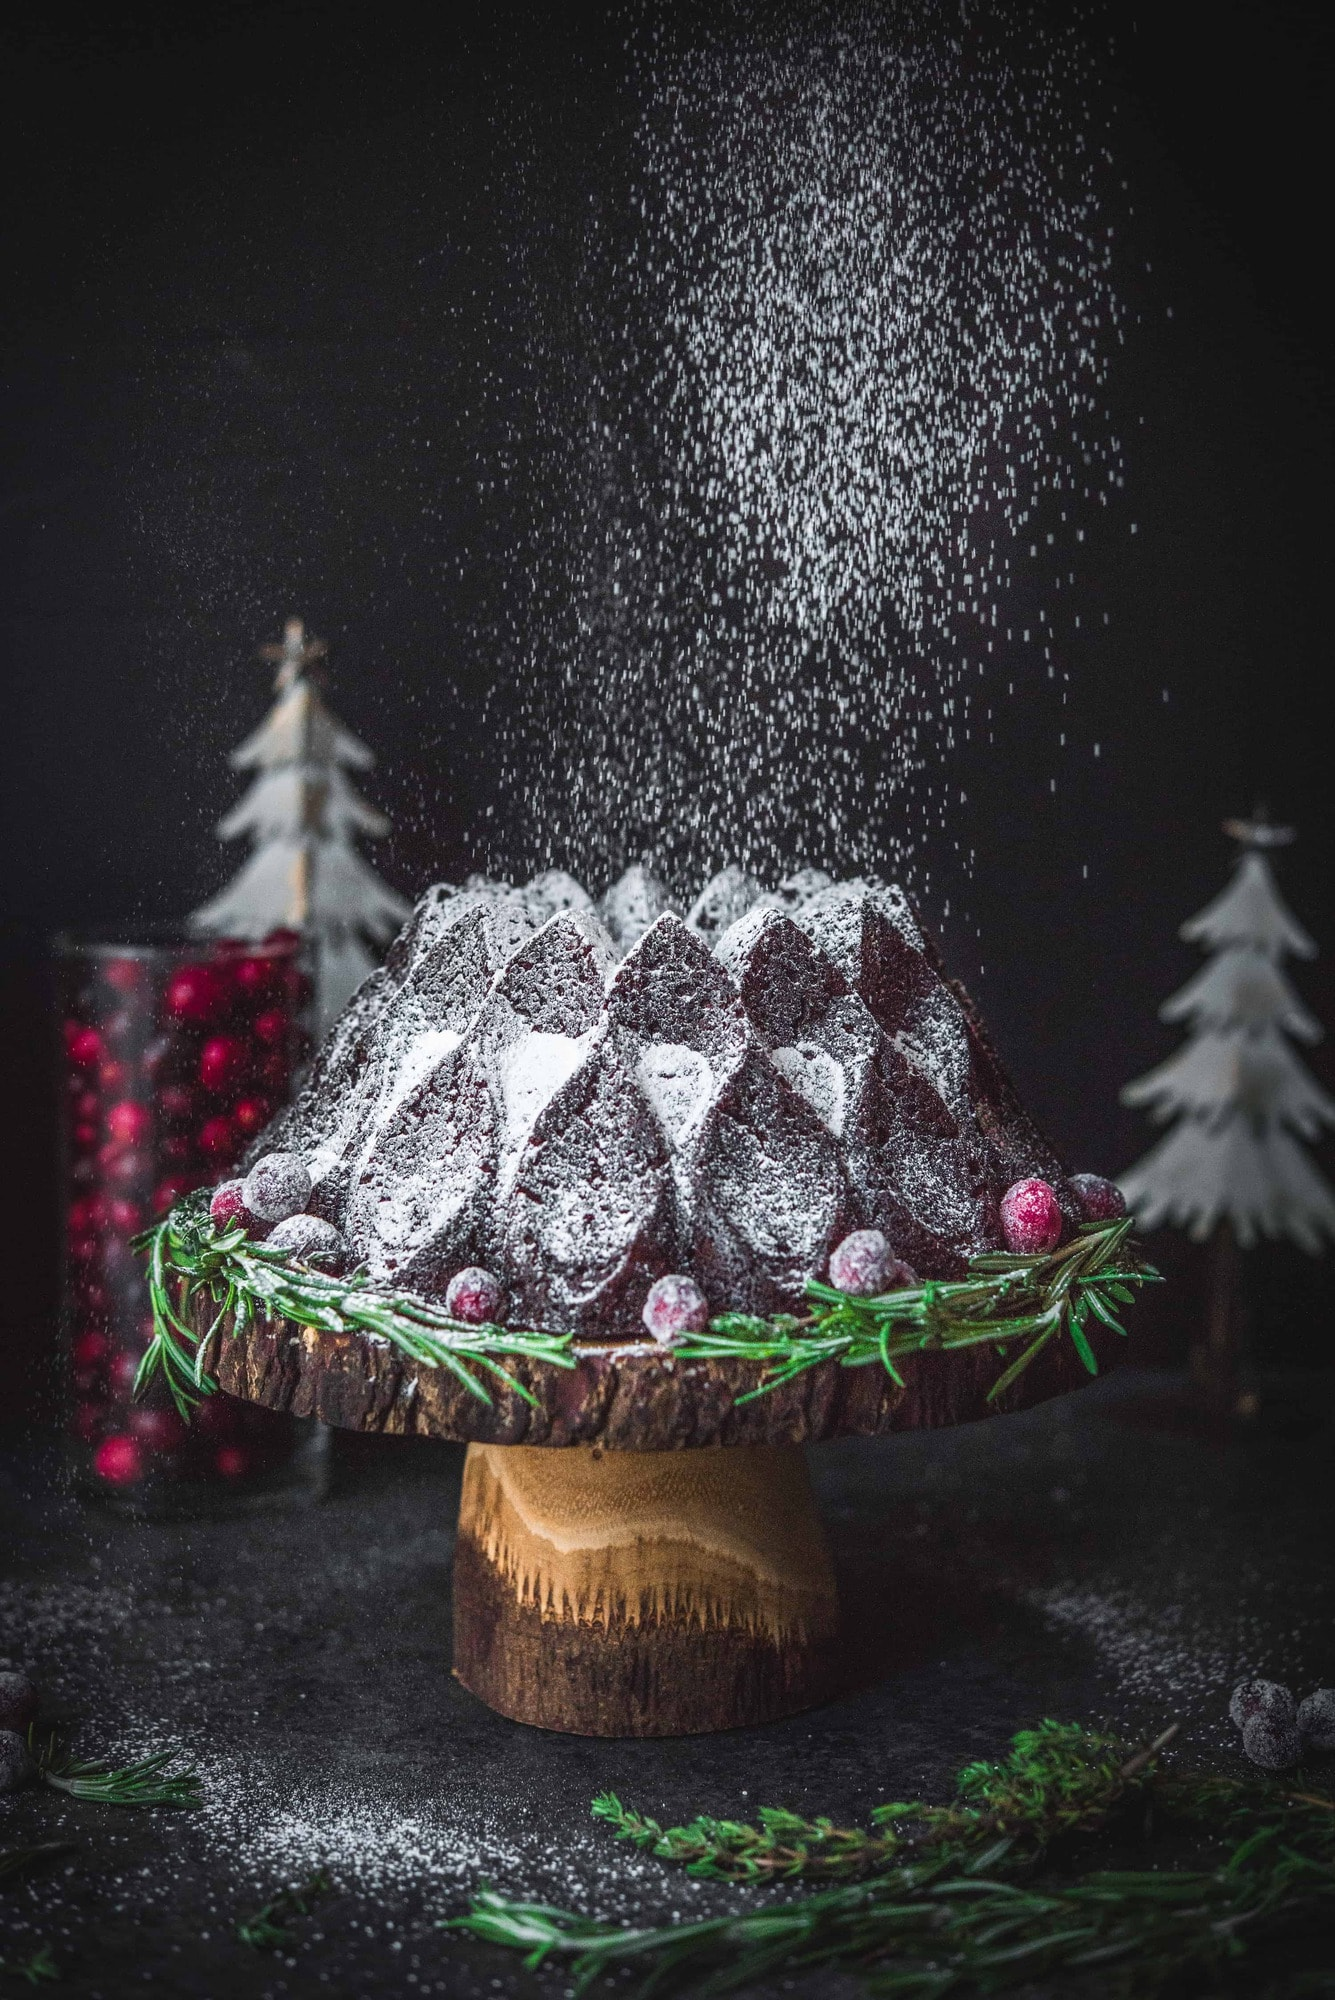 Action shot of powdered sugar falling on chocolate gingerbread bundt cake